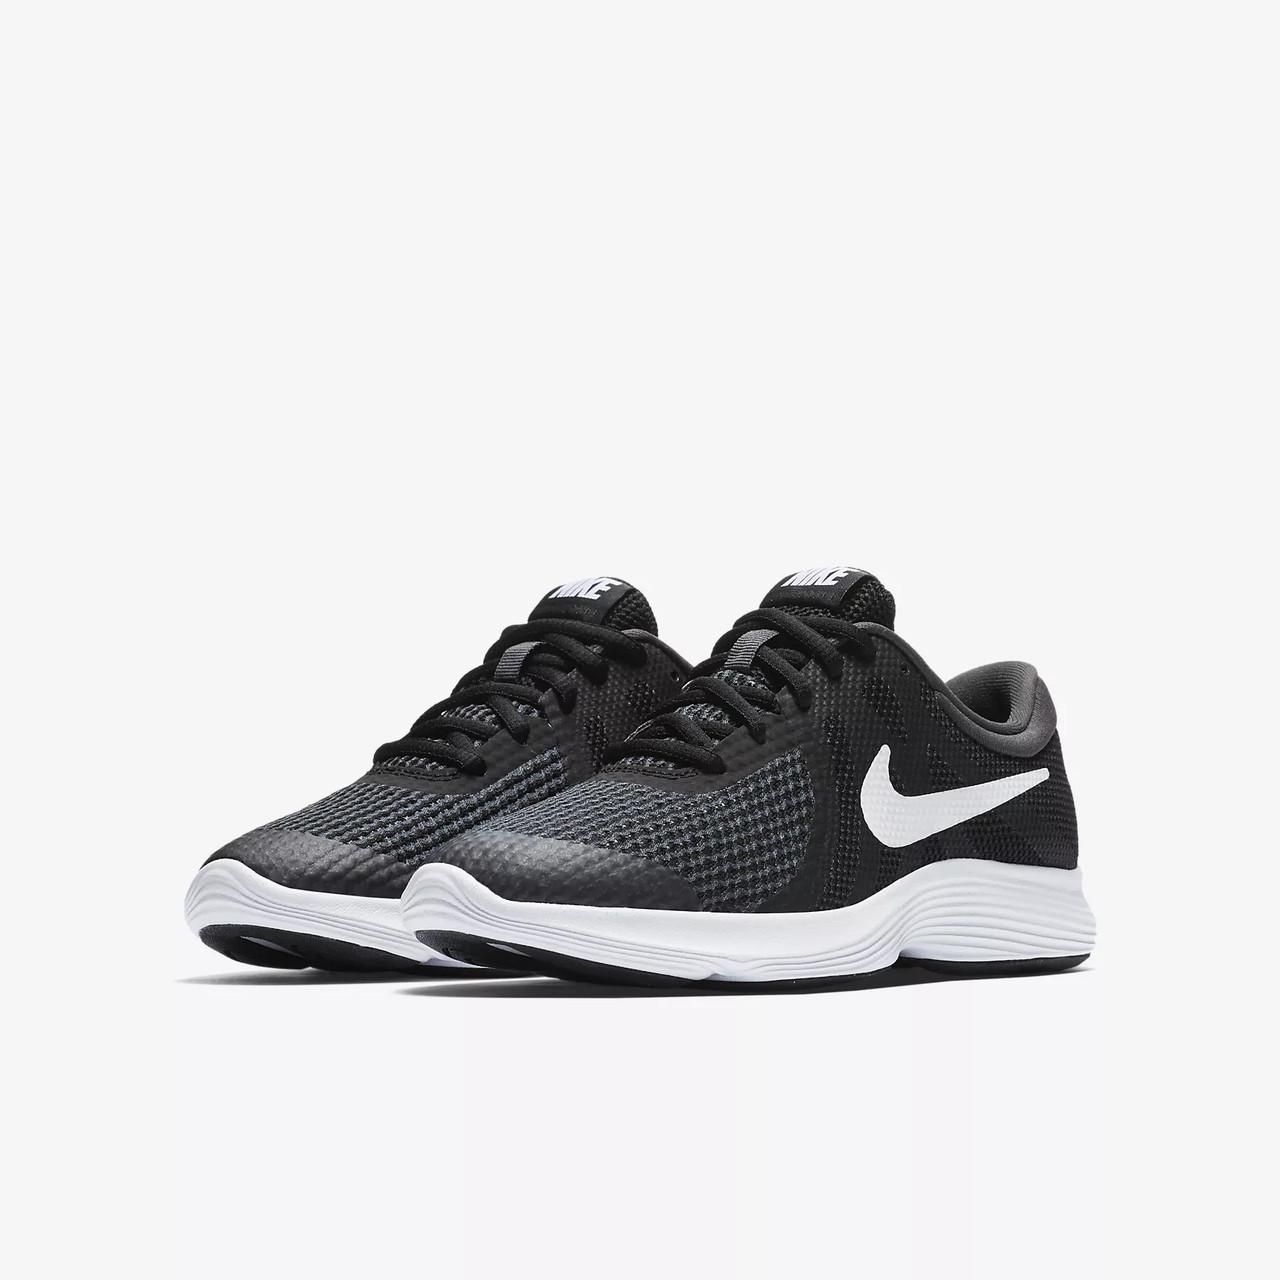 58d55917 Детские Кроссовки Nike Revolution 4 Gs 943309-006 (Оригинал) - Football  Mall -